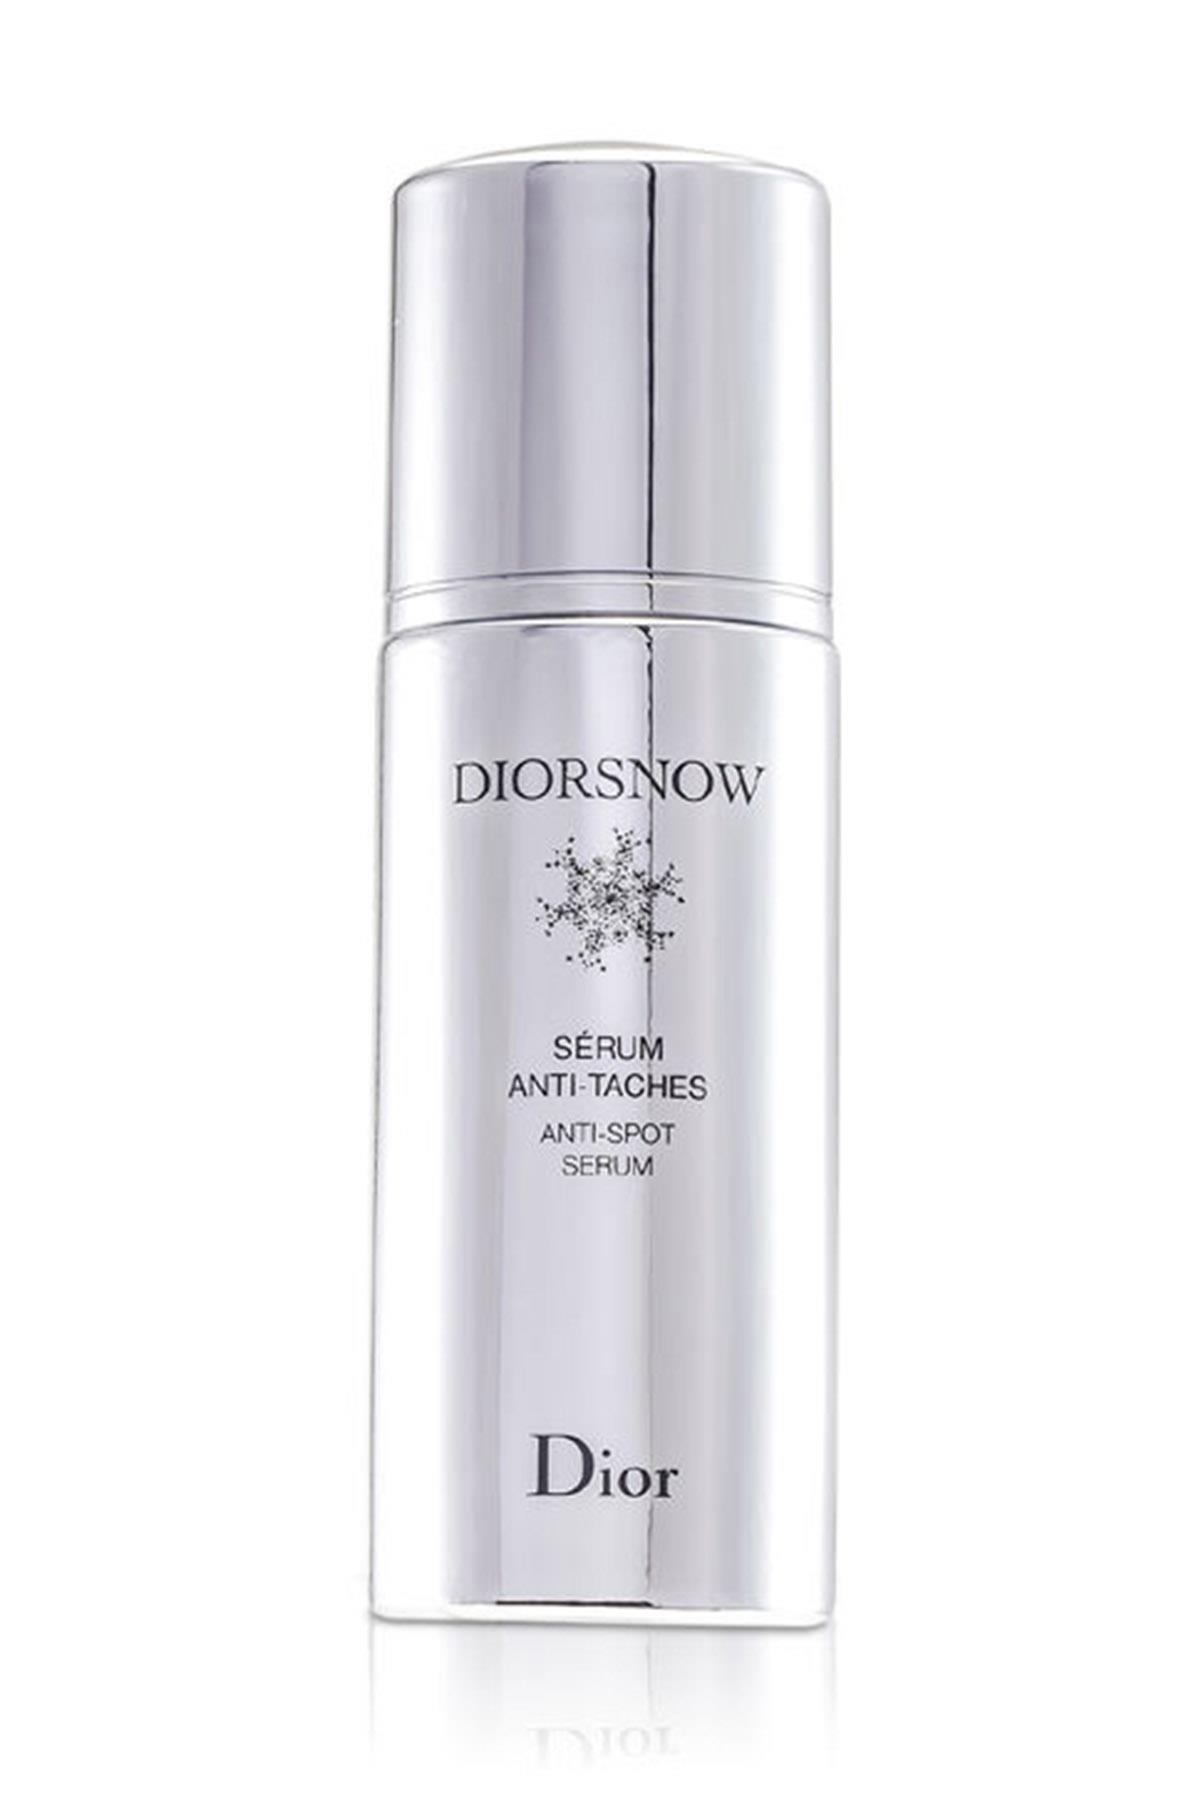 Dior Diorsnow Anti Spot Serum 30 ml